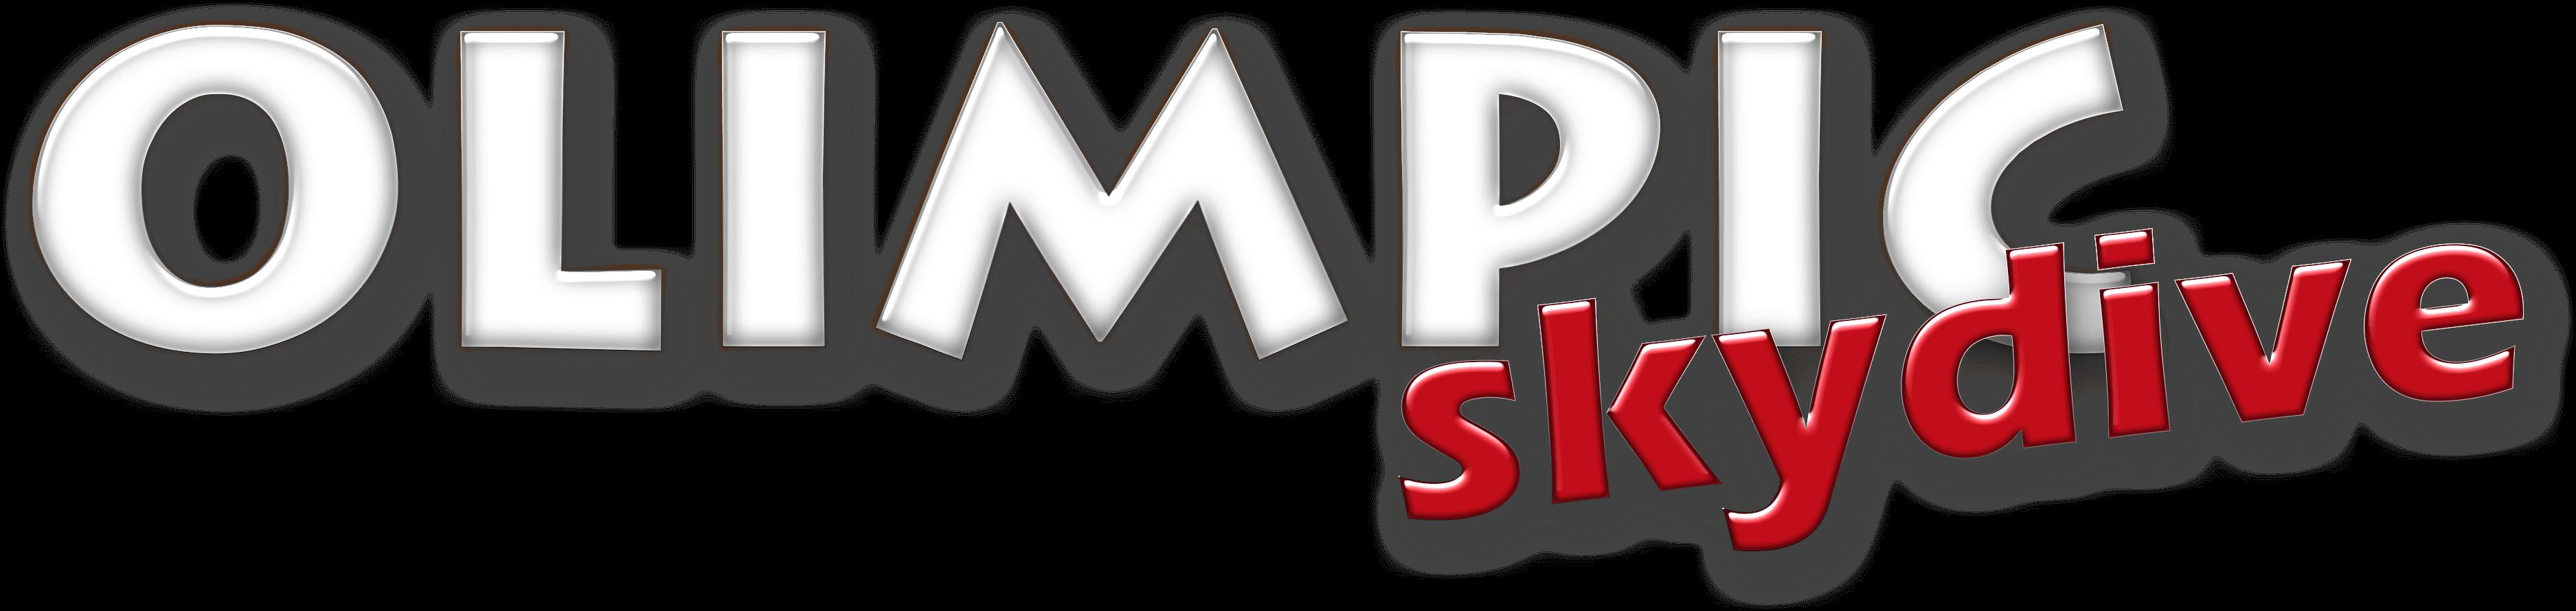 Kontakt | Olimpic Skydive Mirosławice